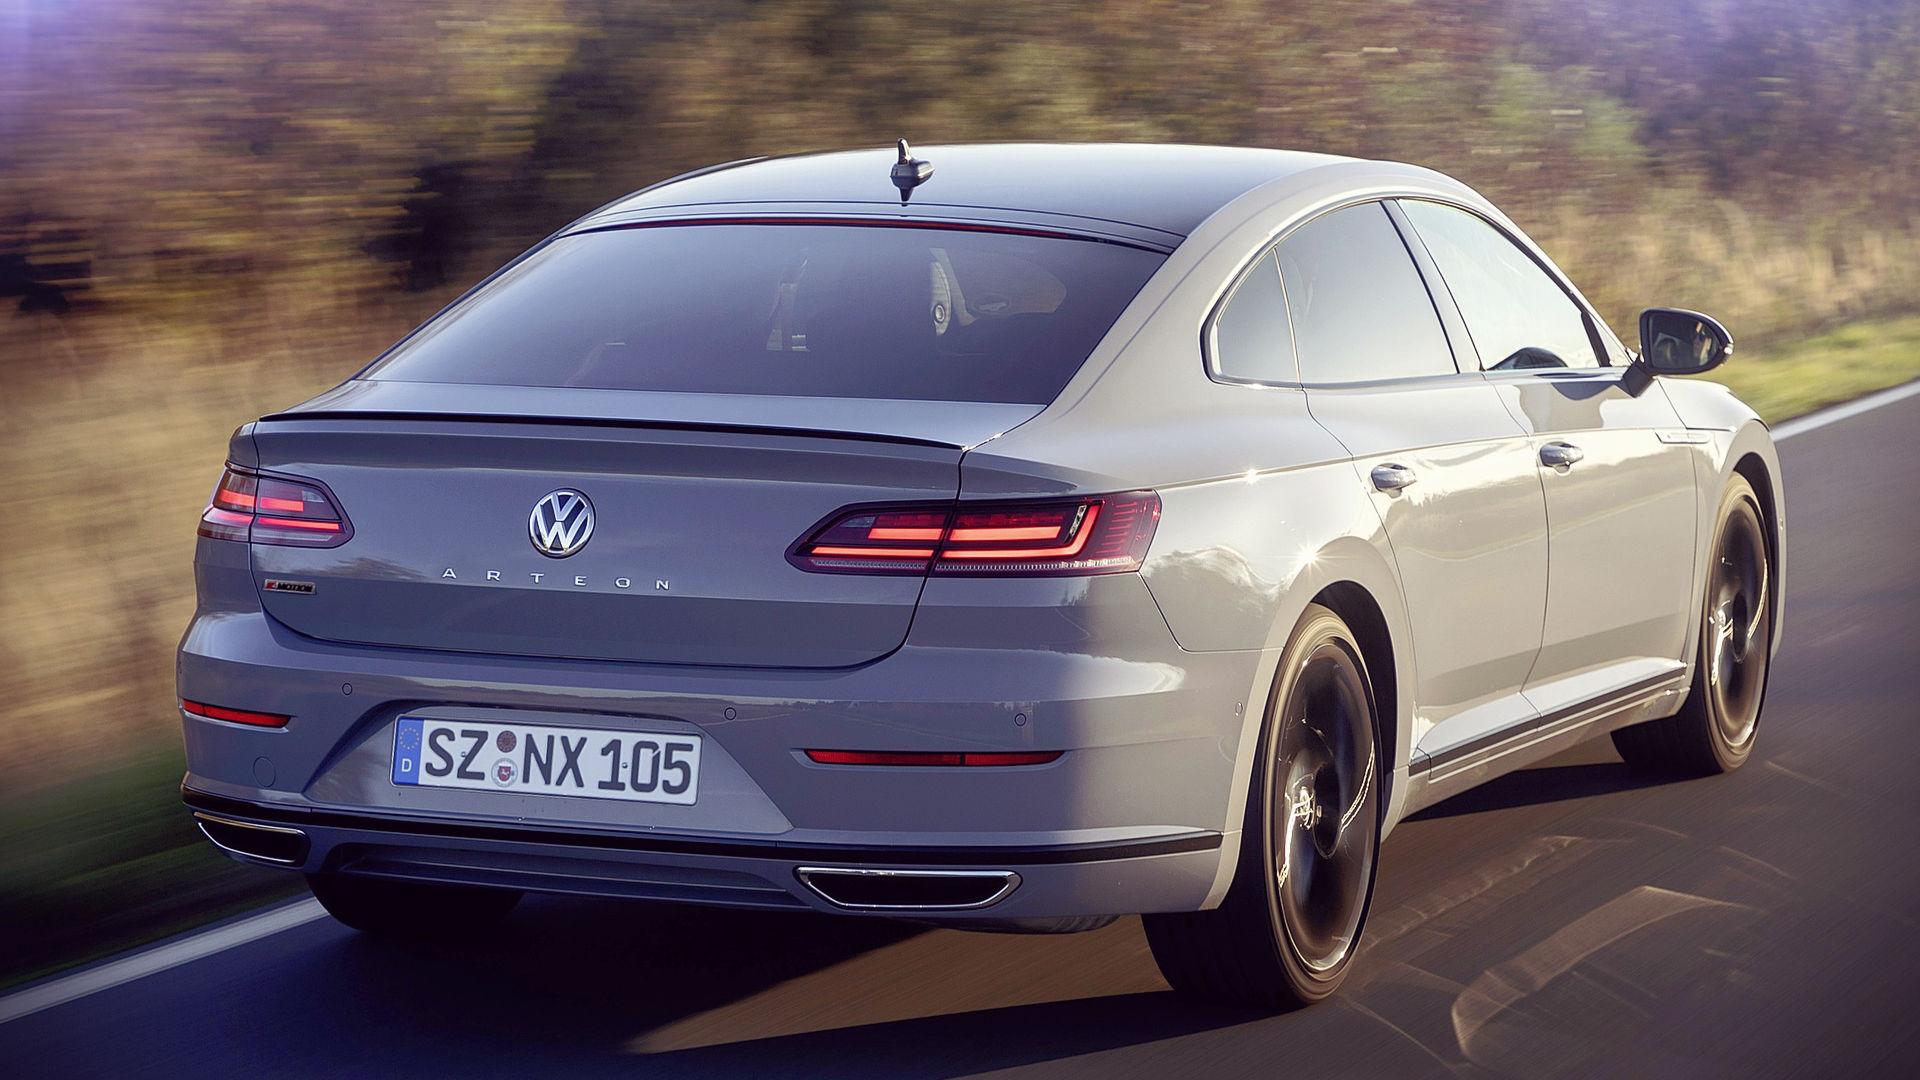 Volkswagen Arteon R Line Edition 2020 Back Wallpaper